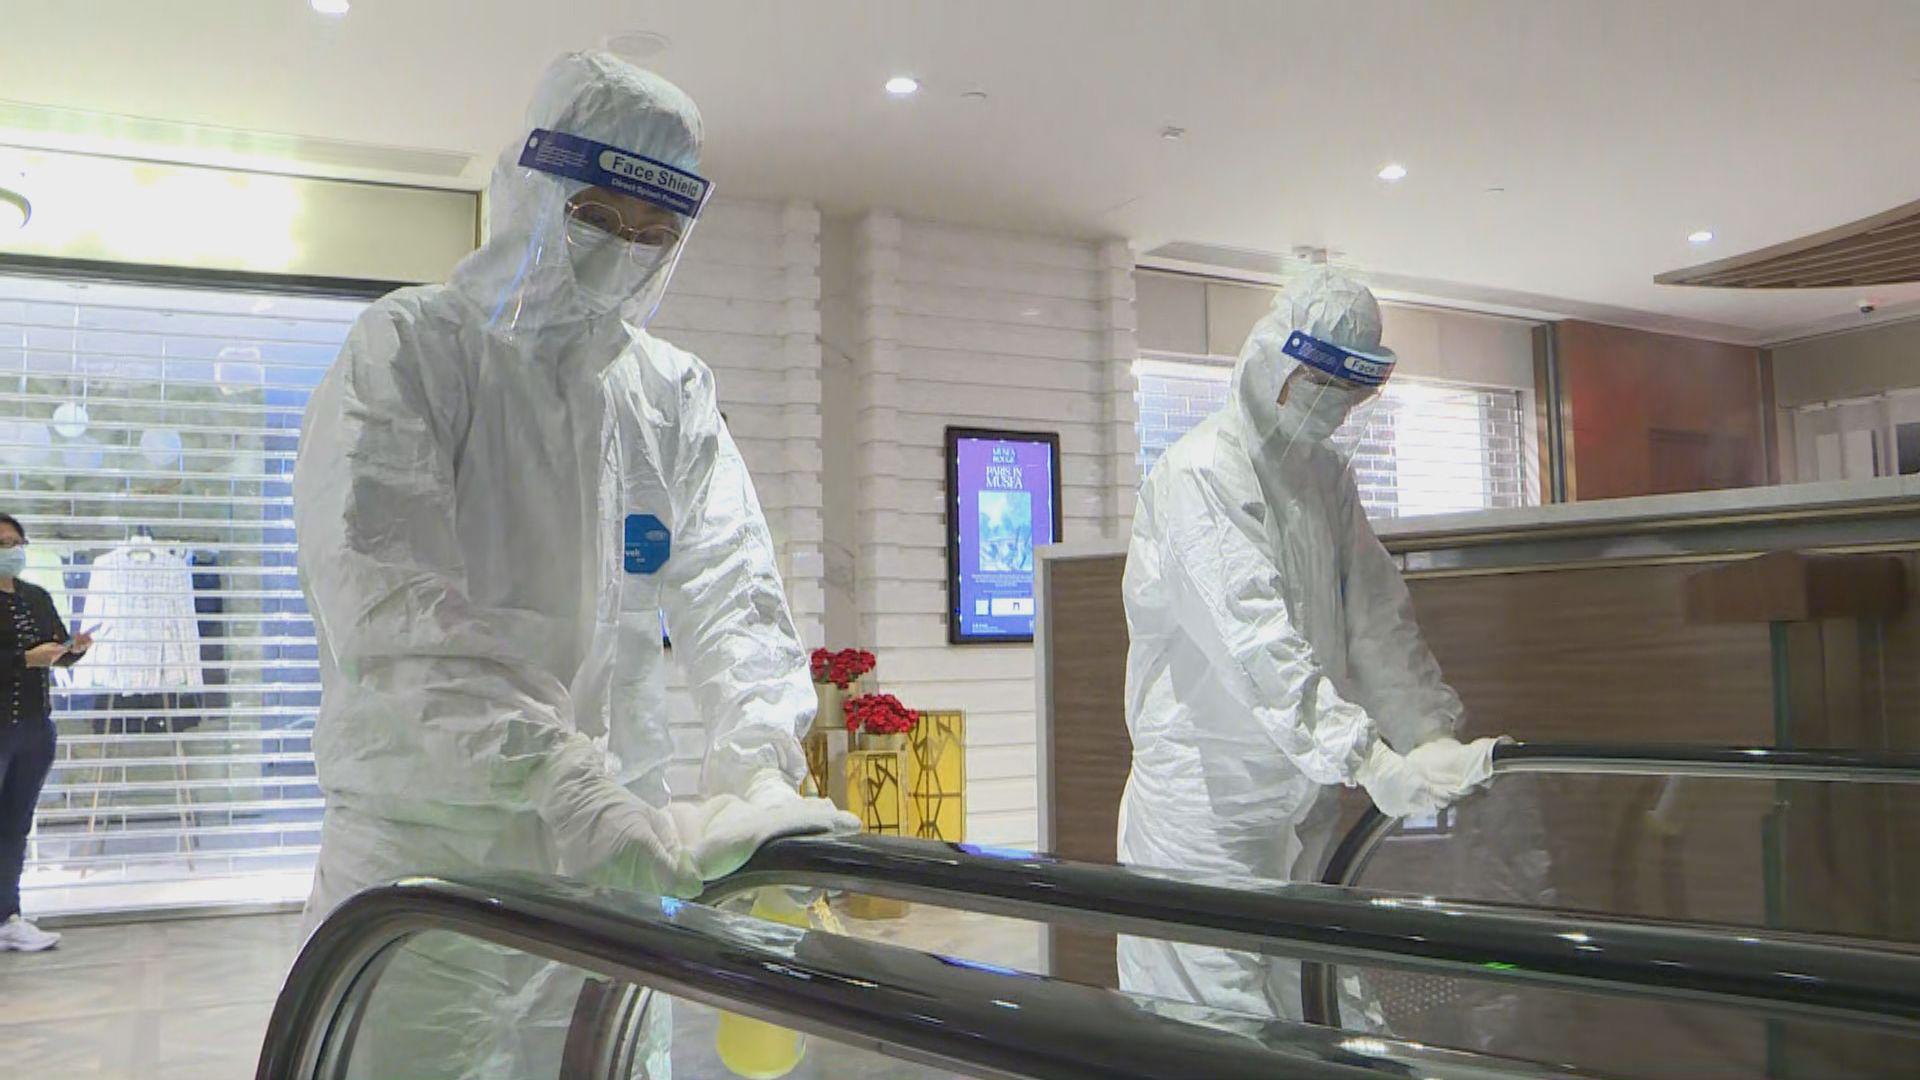 K11 Musea周日起主動關閉兩日消毒